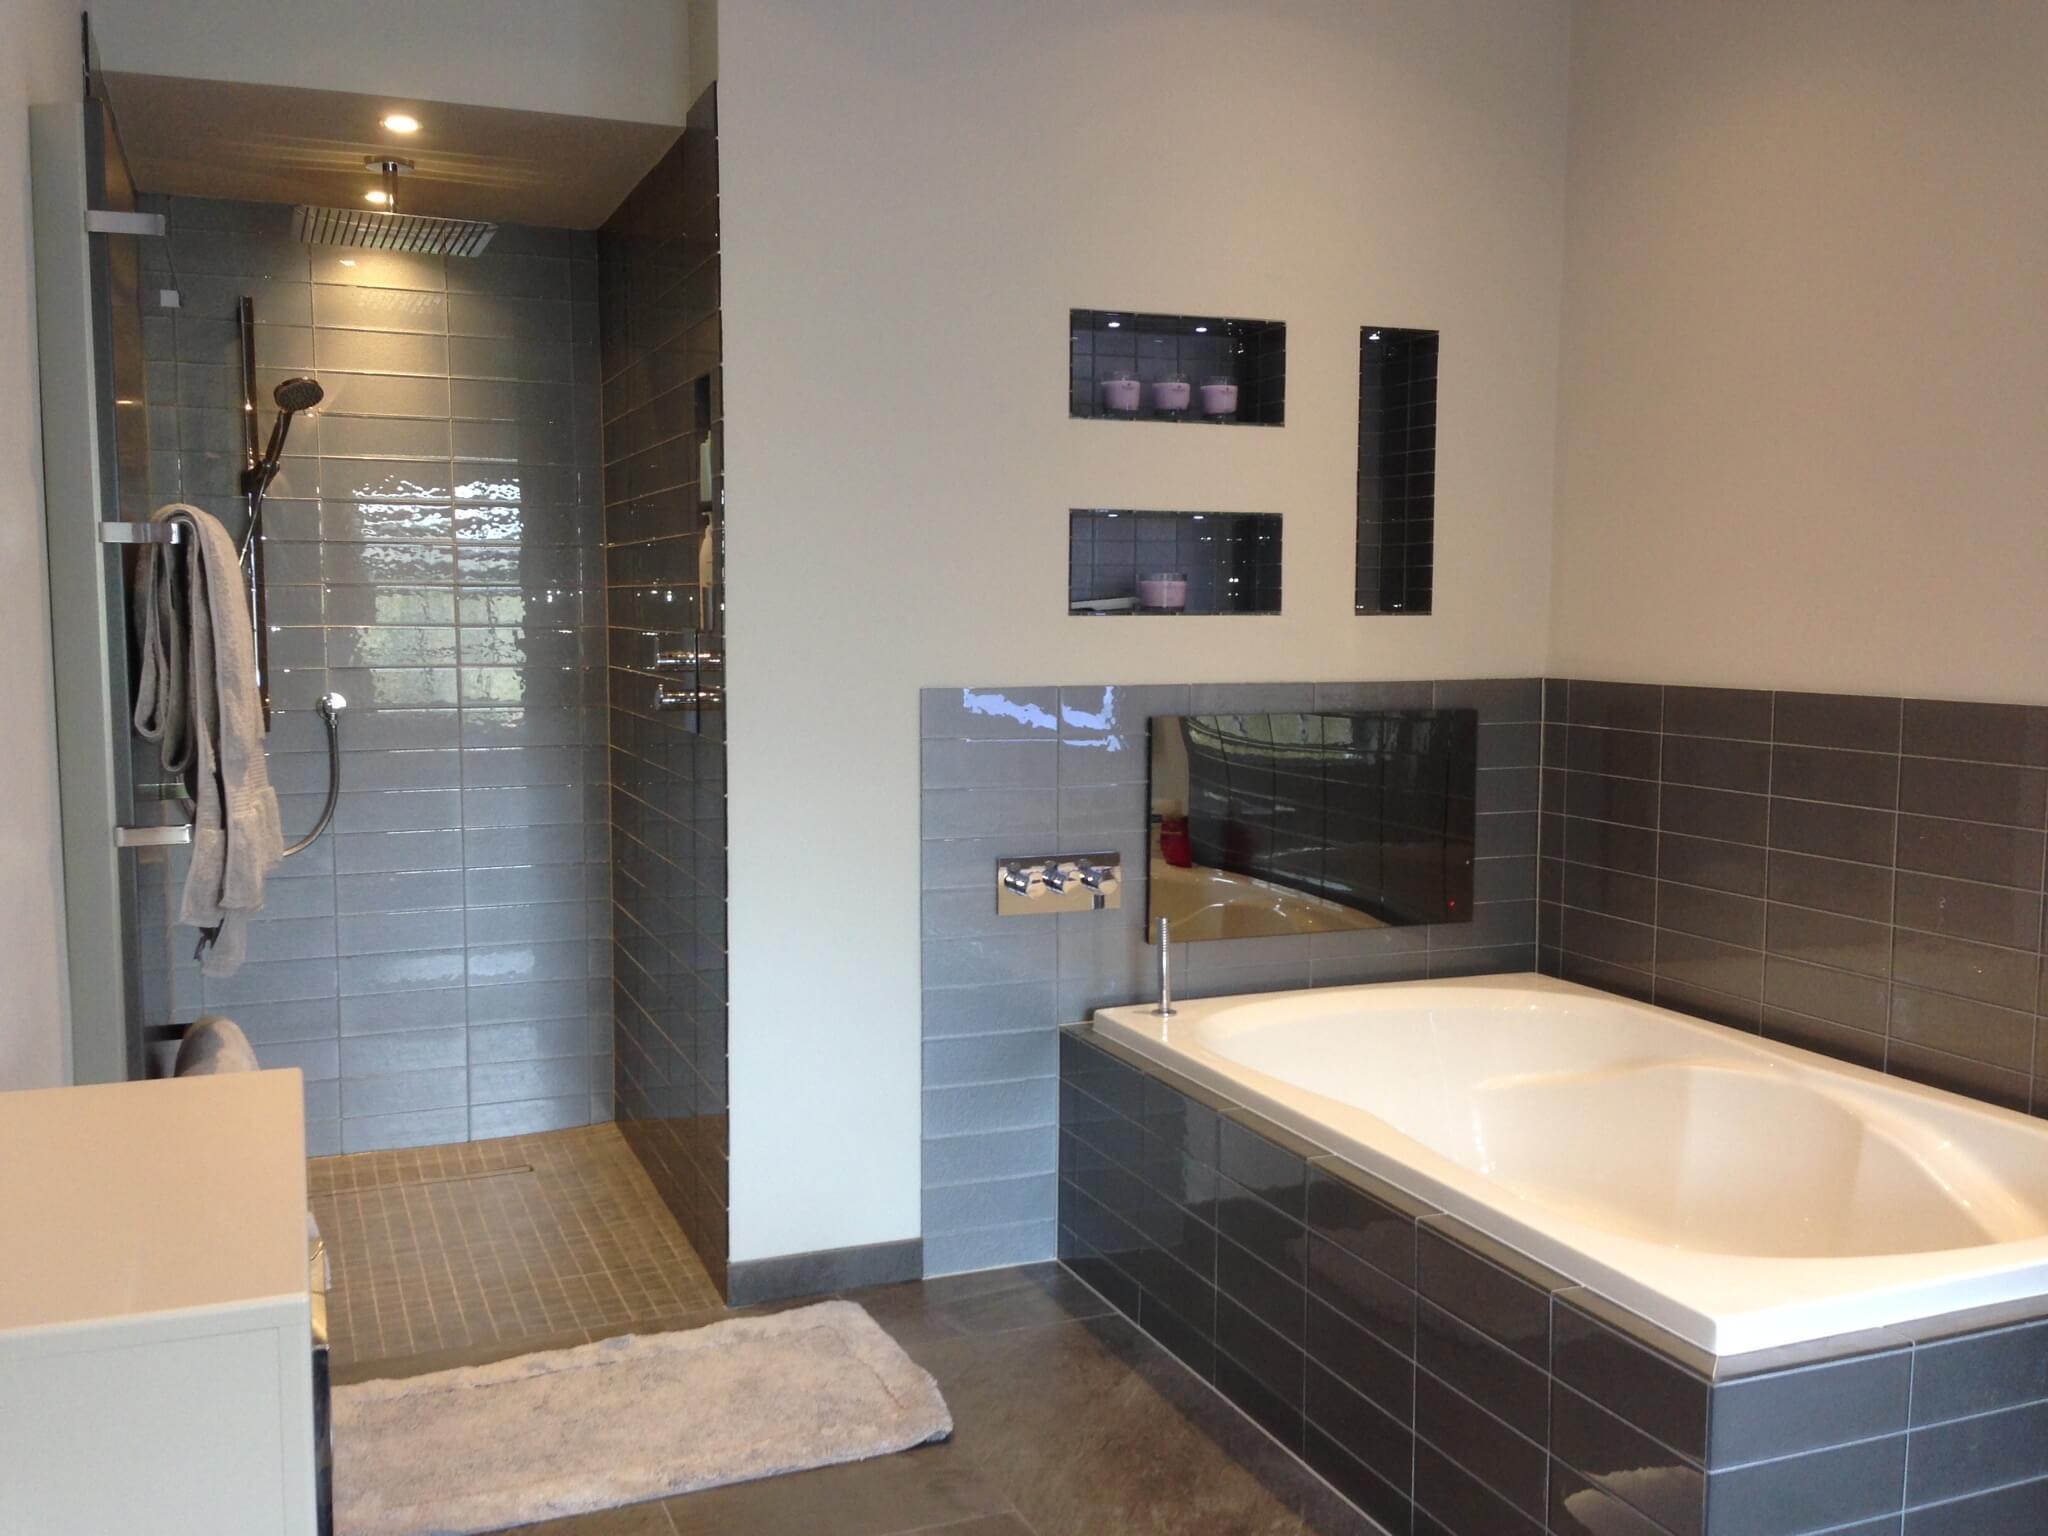 Bathroom Fitters Brentwood: Bathroom Designers, Bathroom Ideas, Bathroom Fitters